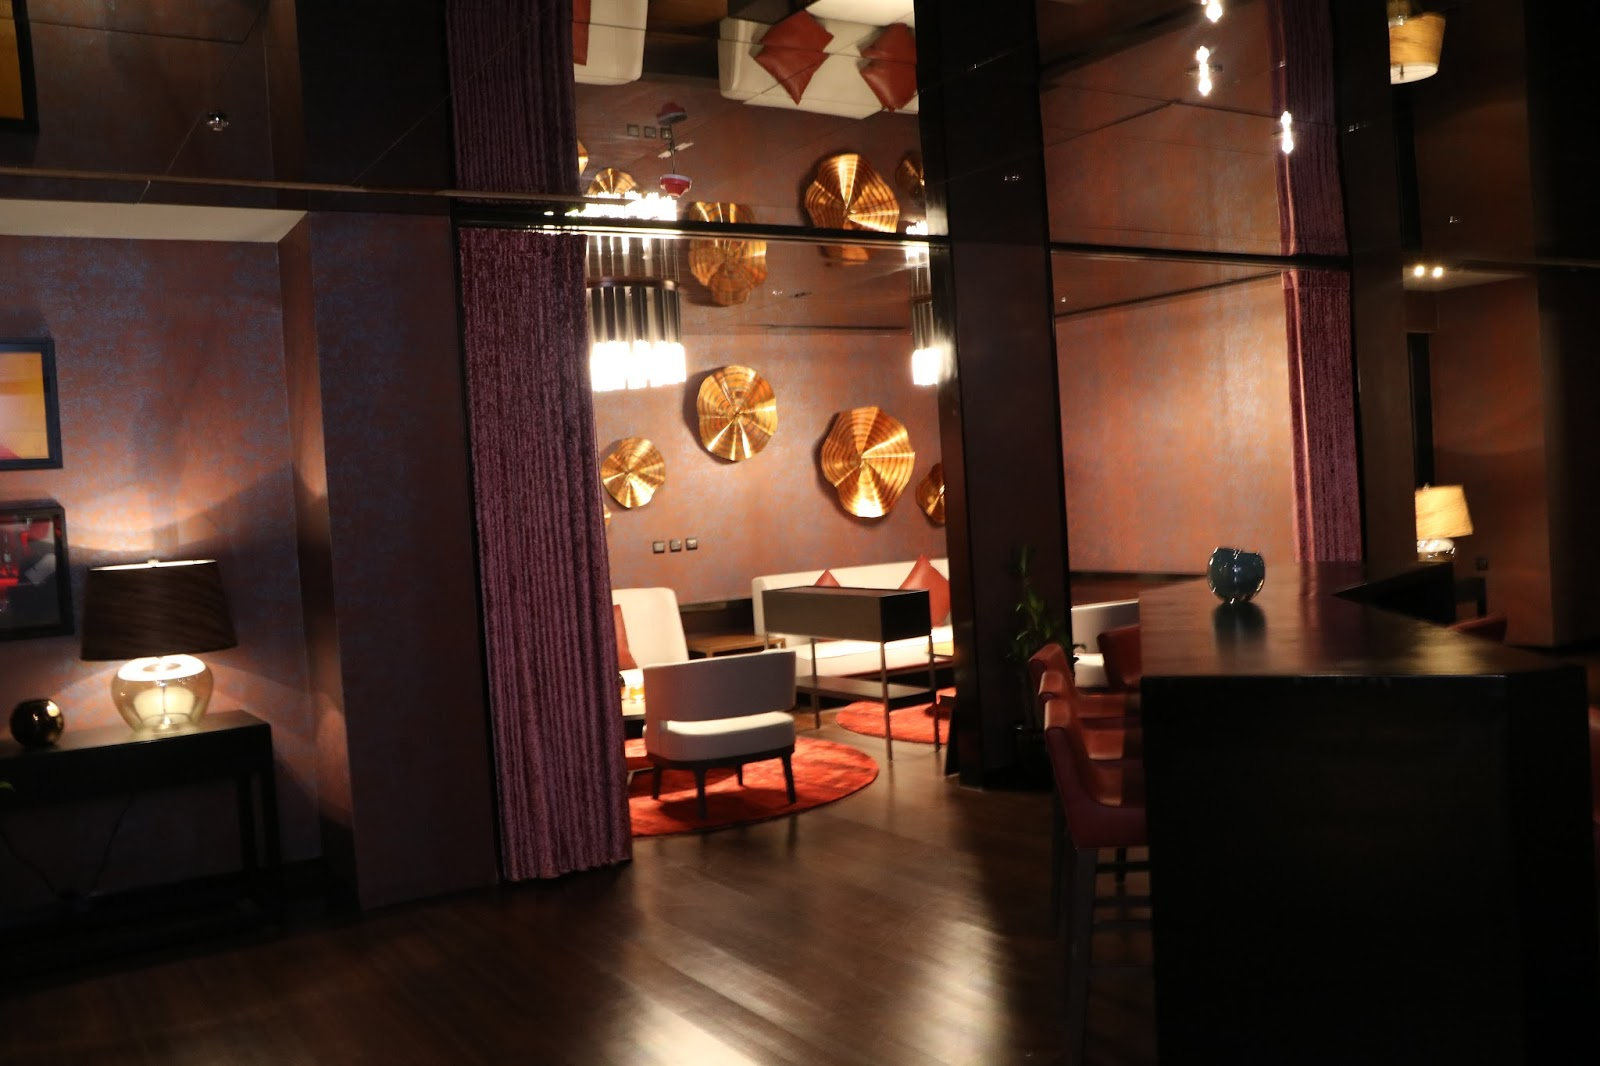 midori clark hotel and casino cigar maduro newest and finest